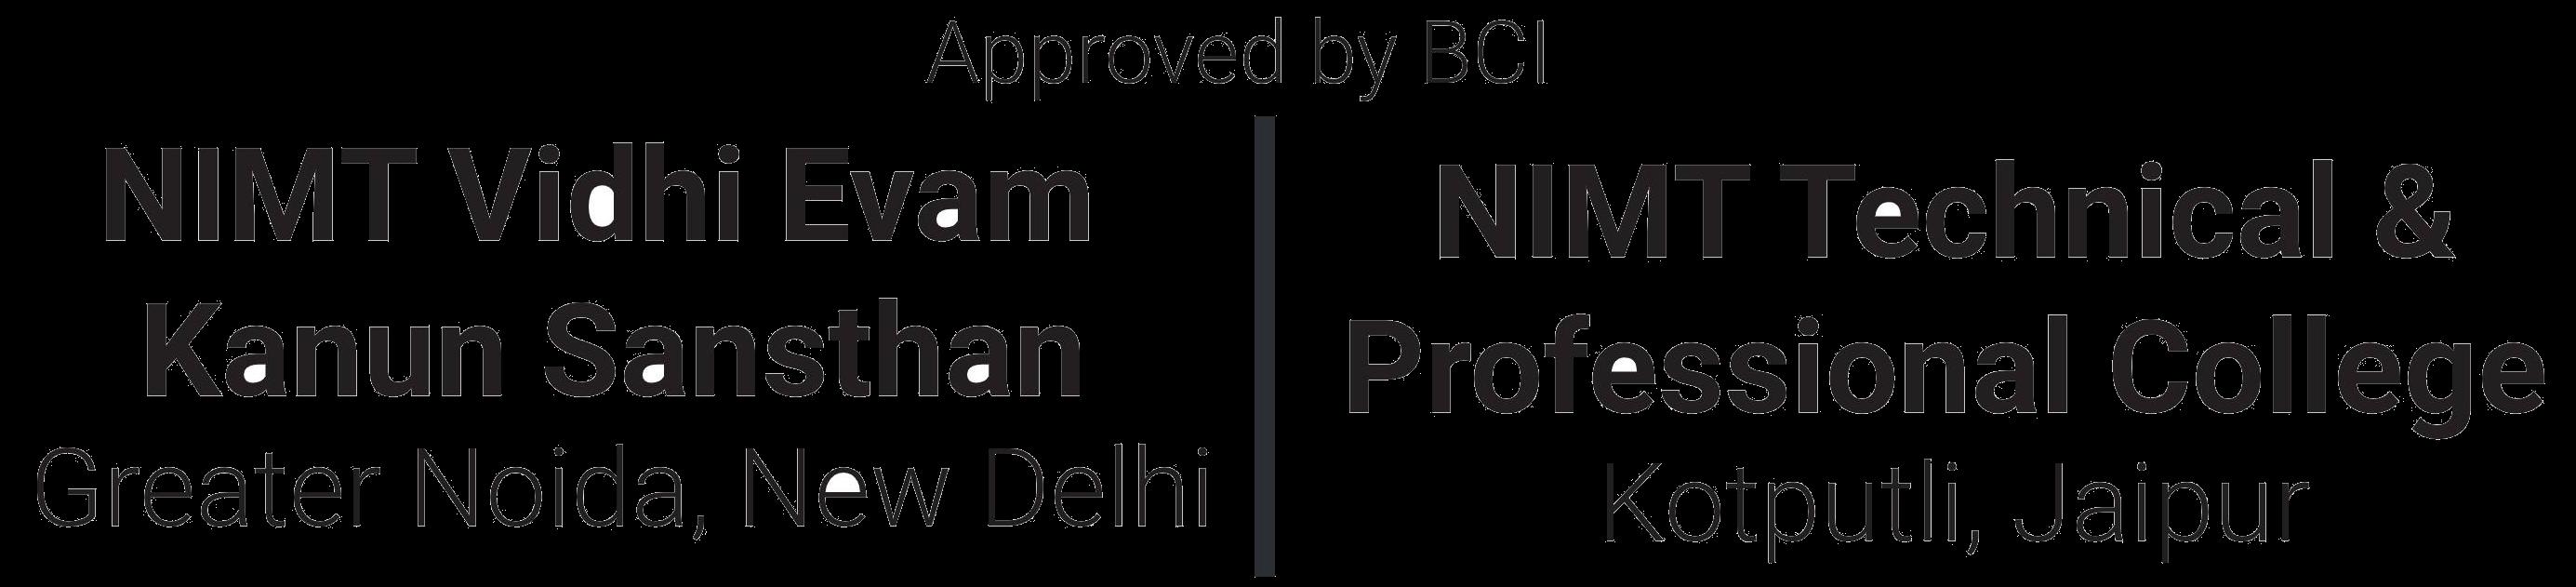 NIMT CLAT 2021 Logo